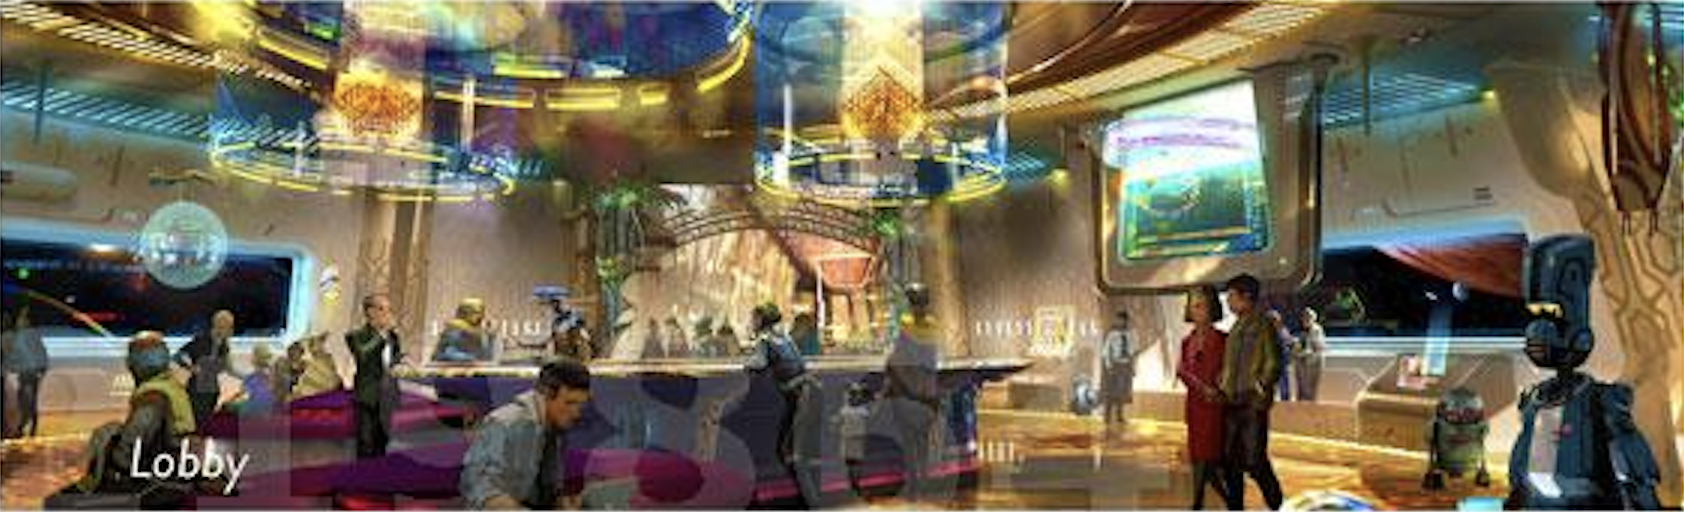 "Concept Art, Star Wars ""Starship"" resort at Walt Disney World"